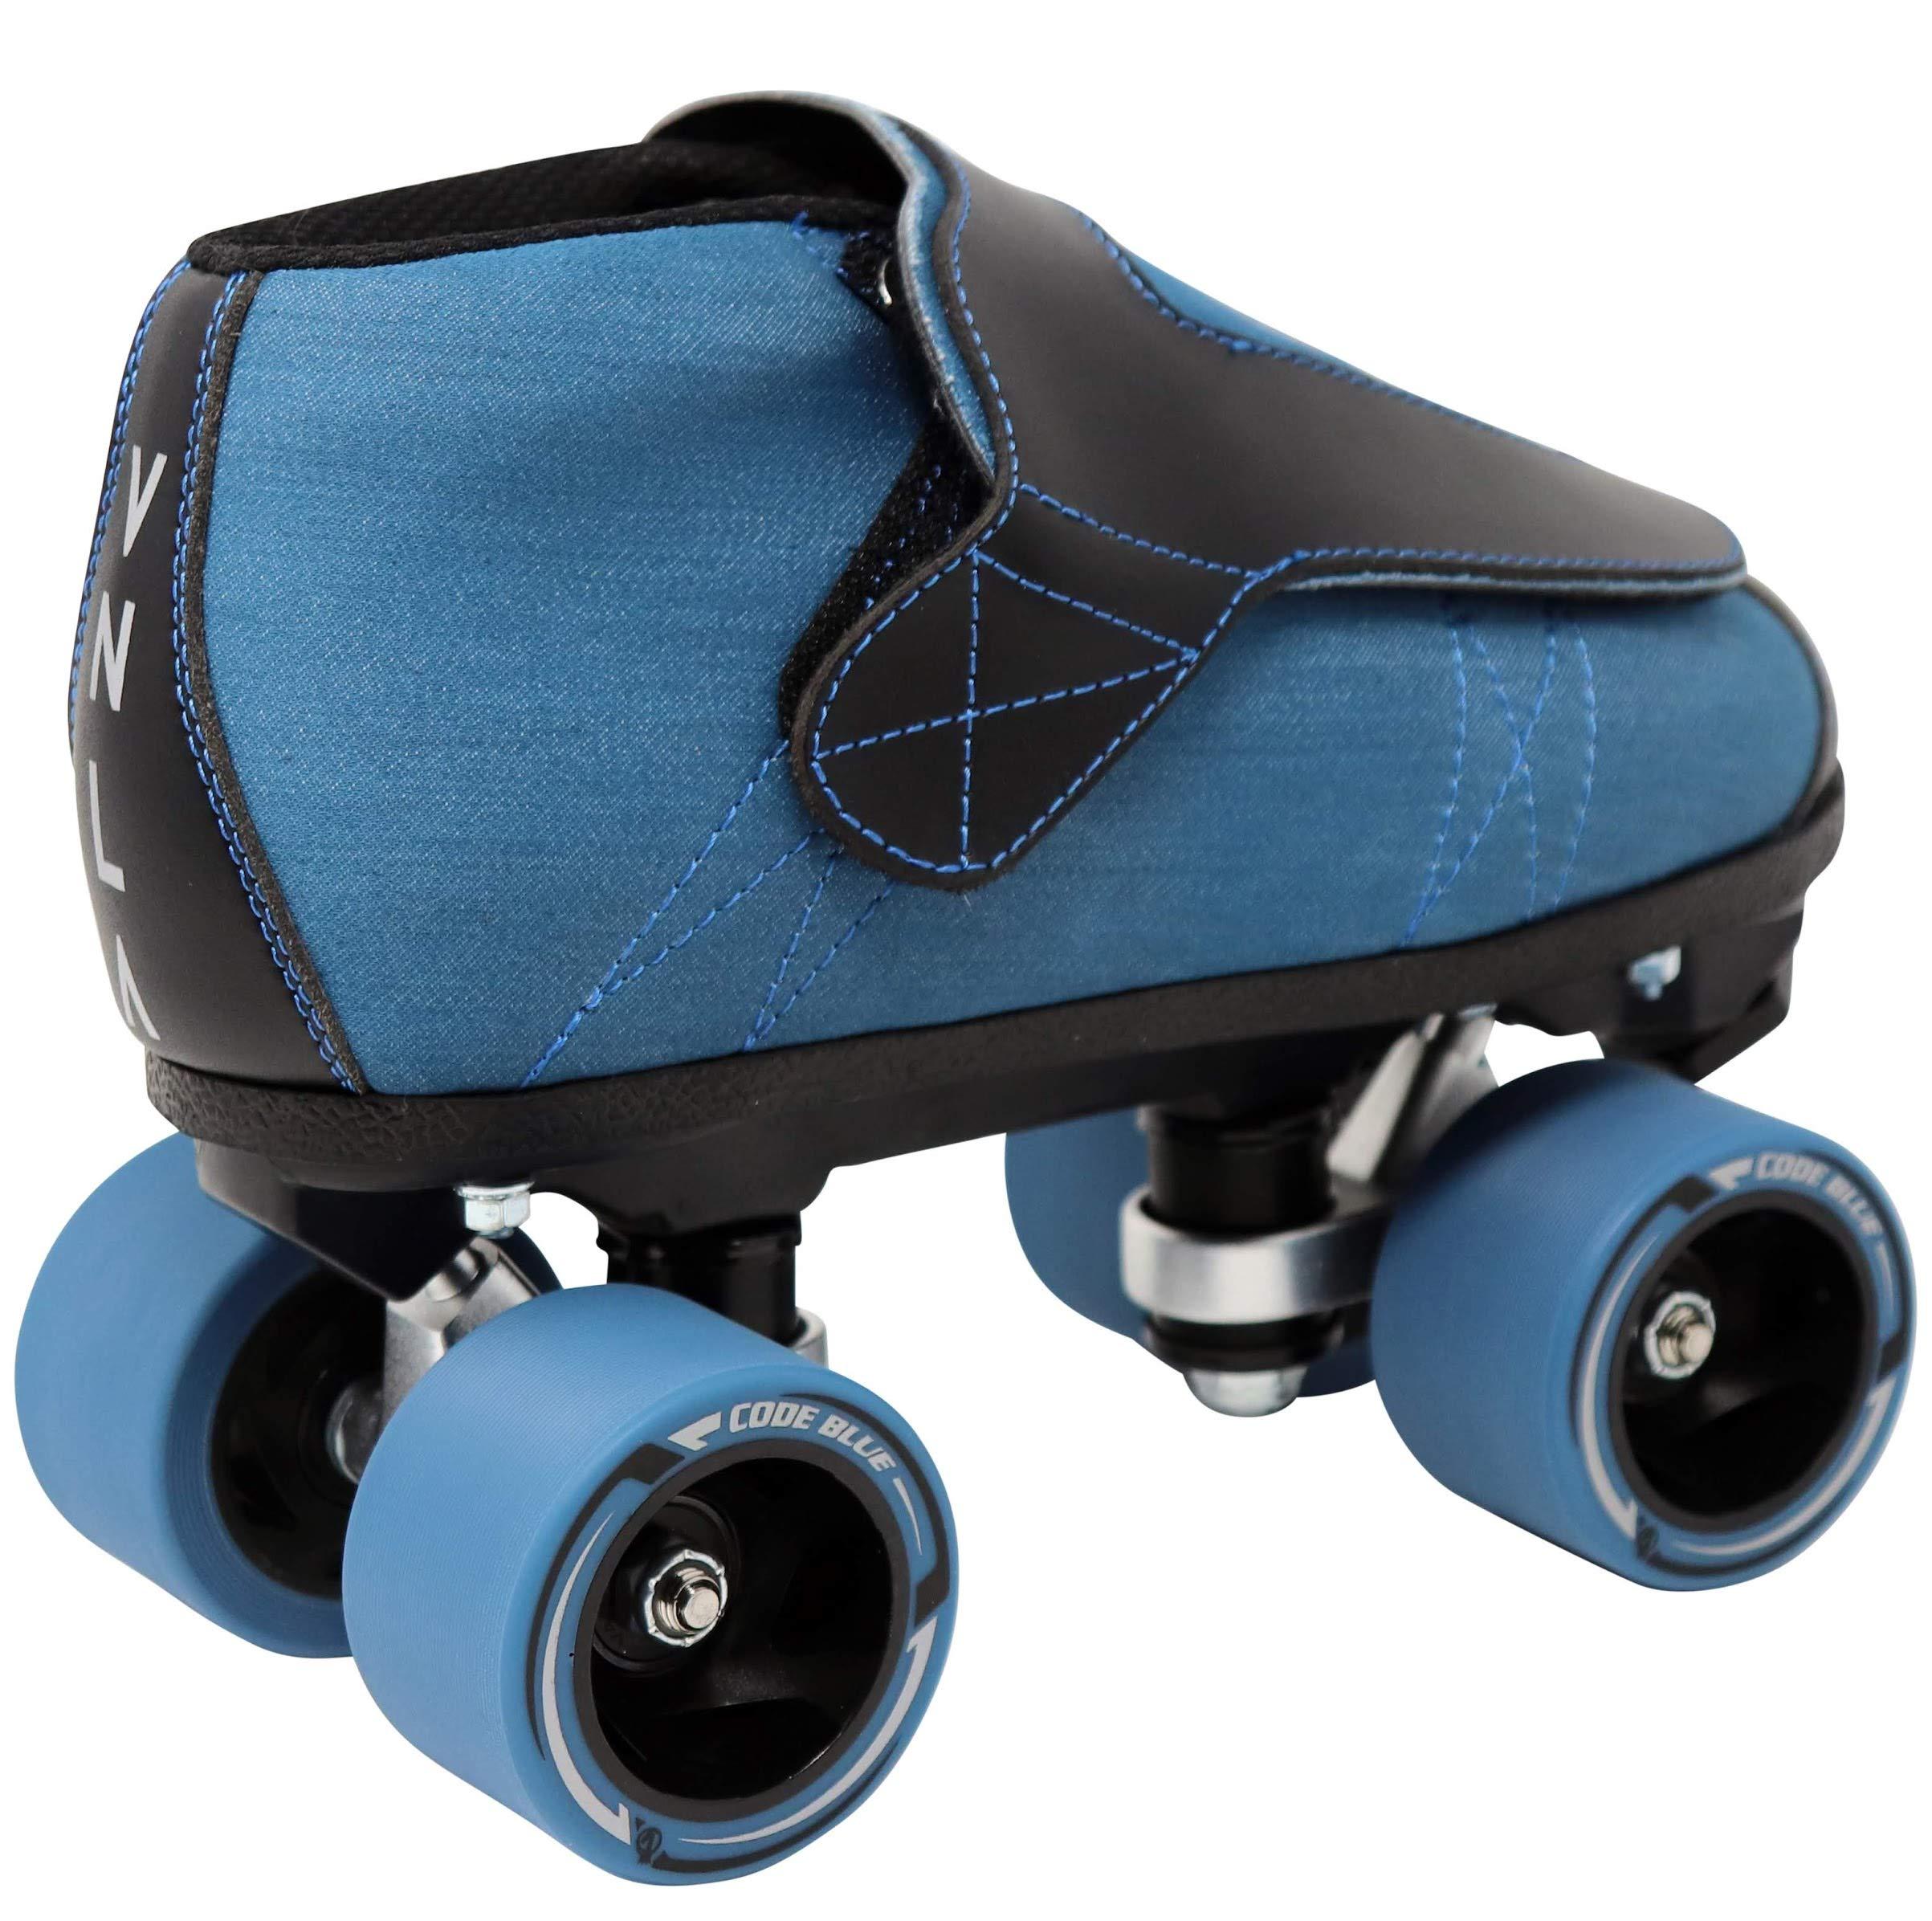 VNLA Code Blue Jam Skate - Mens & Womens Speed Skates - Quad Skates for Women & Men - Adjustable Roller Skate/Rollerskates - Outdoor & Indoor Adult Quad Skate - Kid/Kids Roller Skates (Size 8) by VNLA (Image #3)